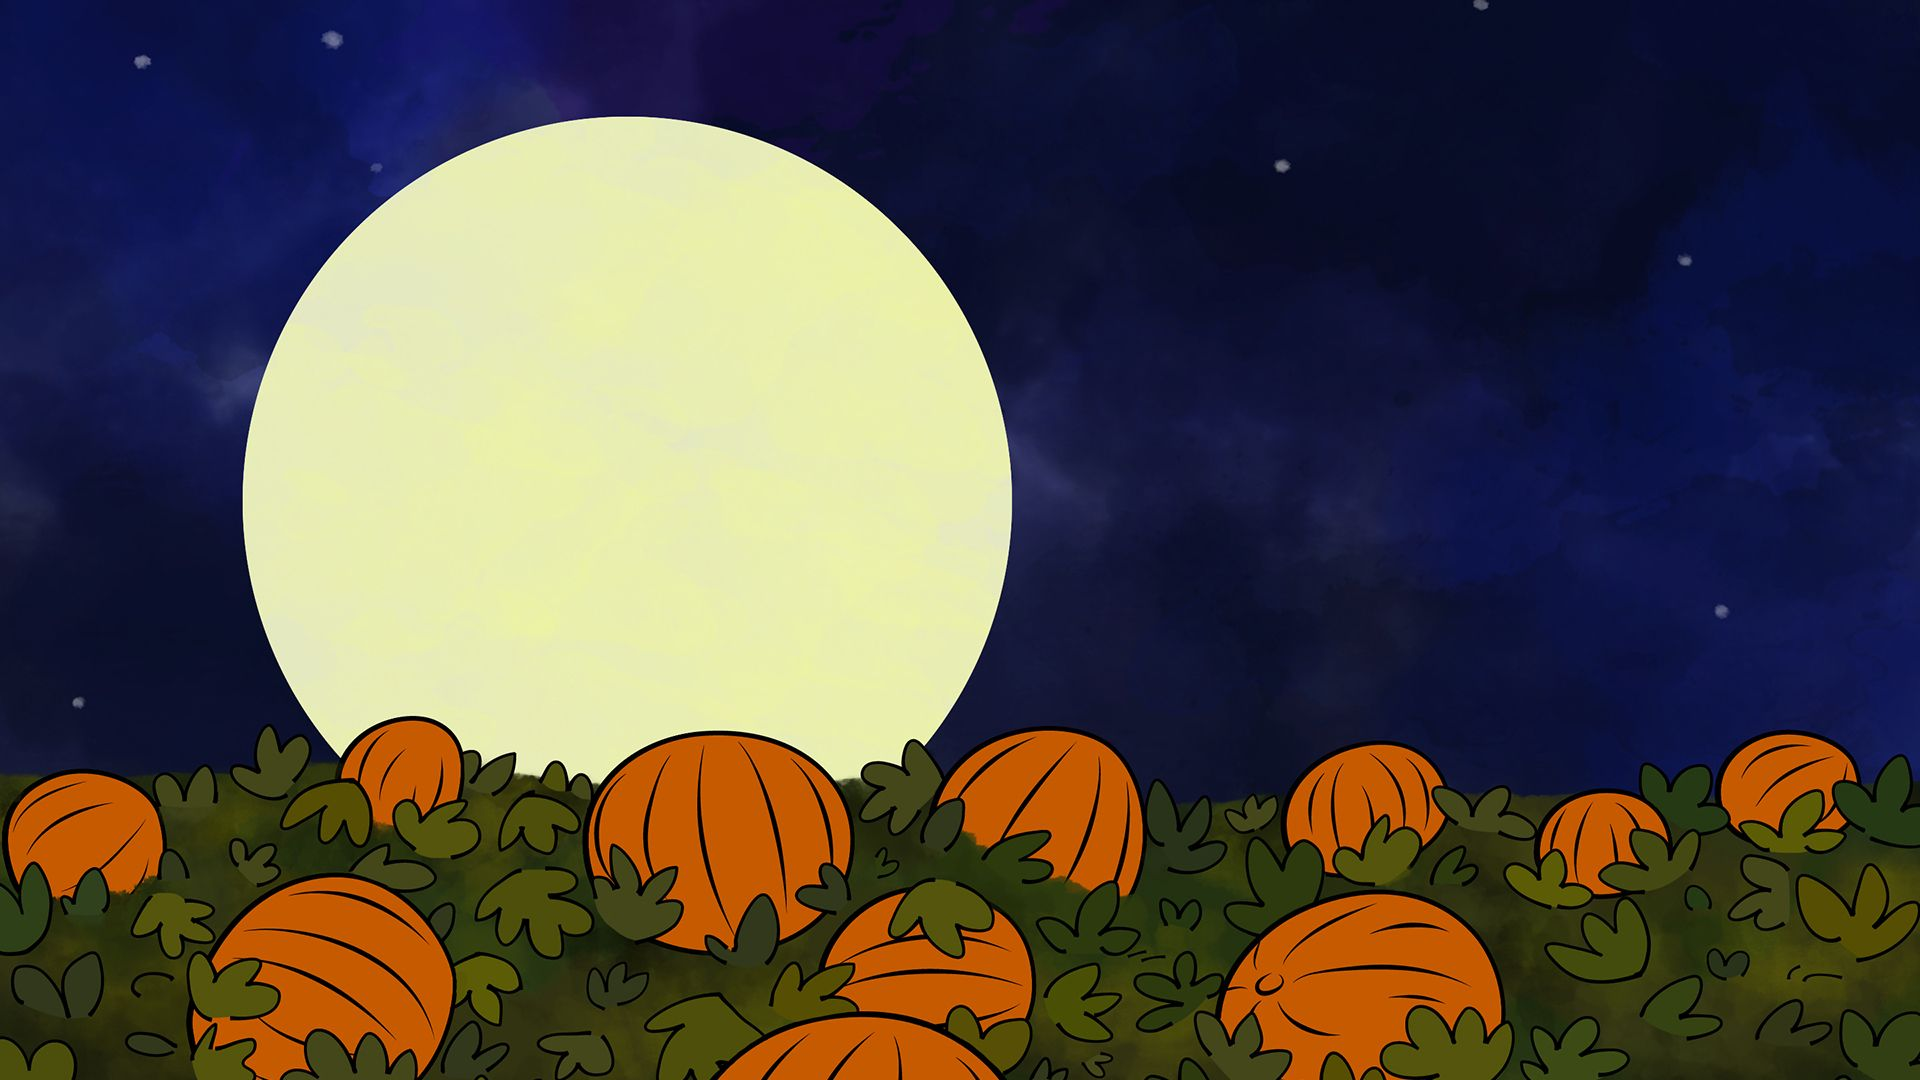 Download Great Pumpkin Charlie Brown Backgrounds 1920x1080